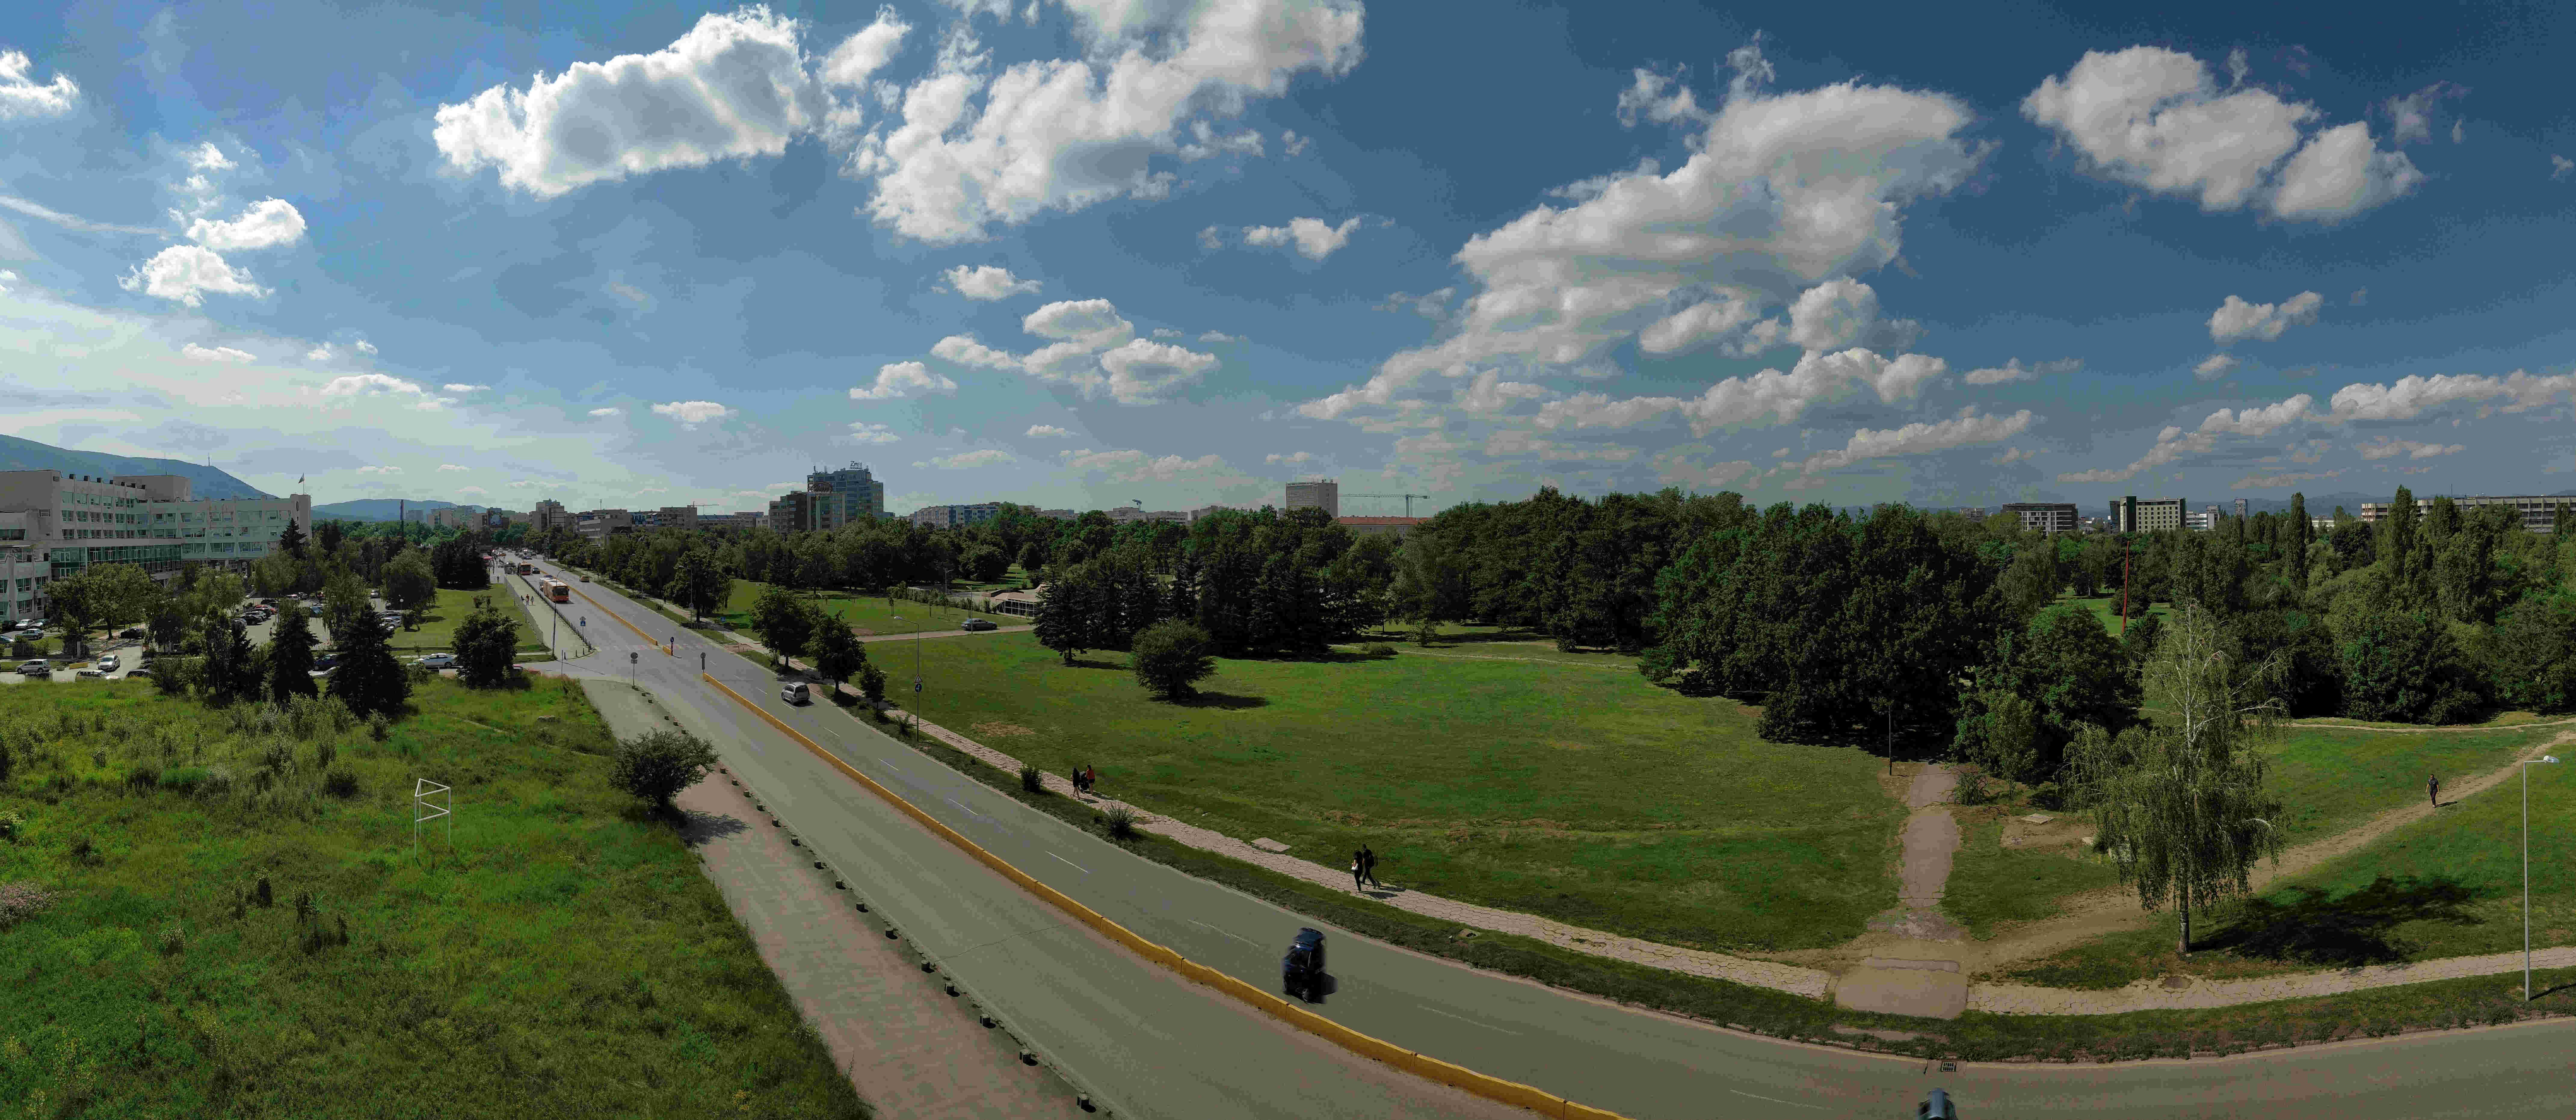 panorama качество фото OnePlus 5